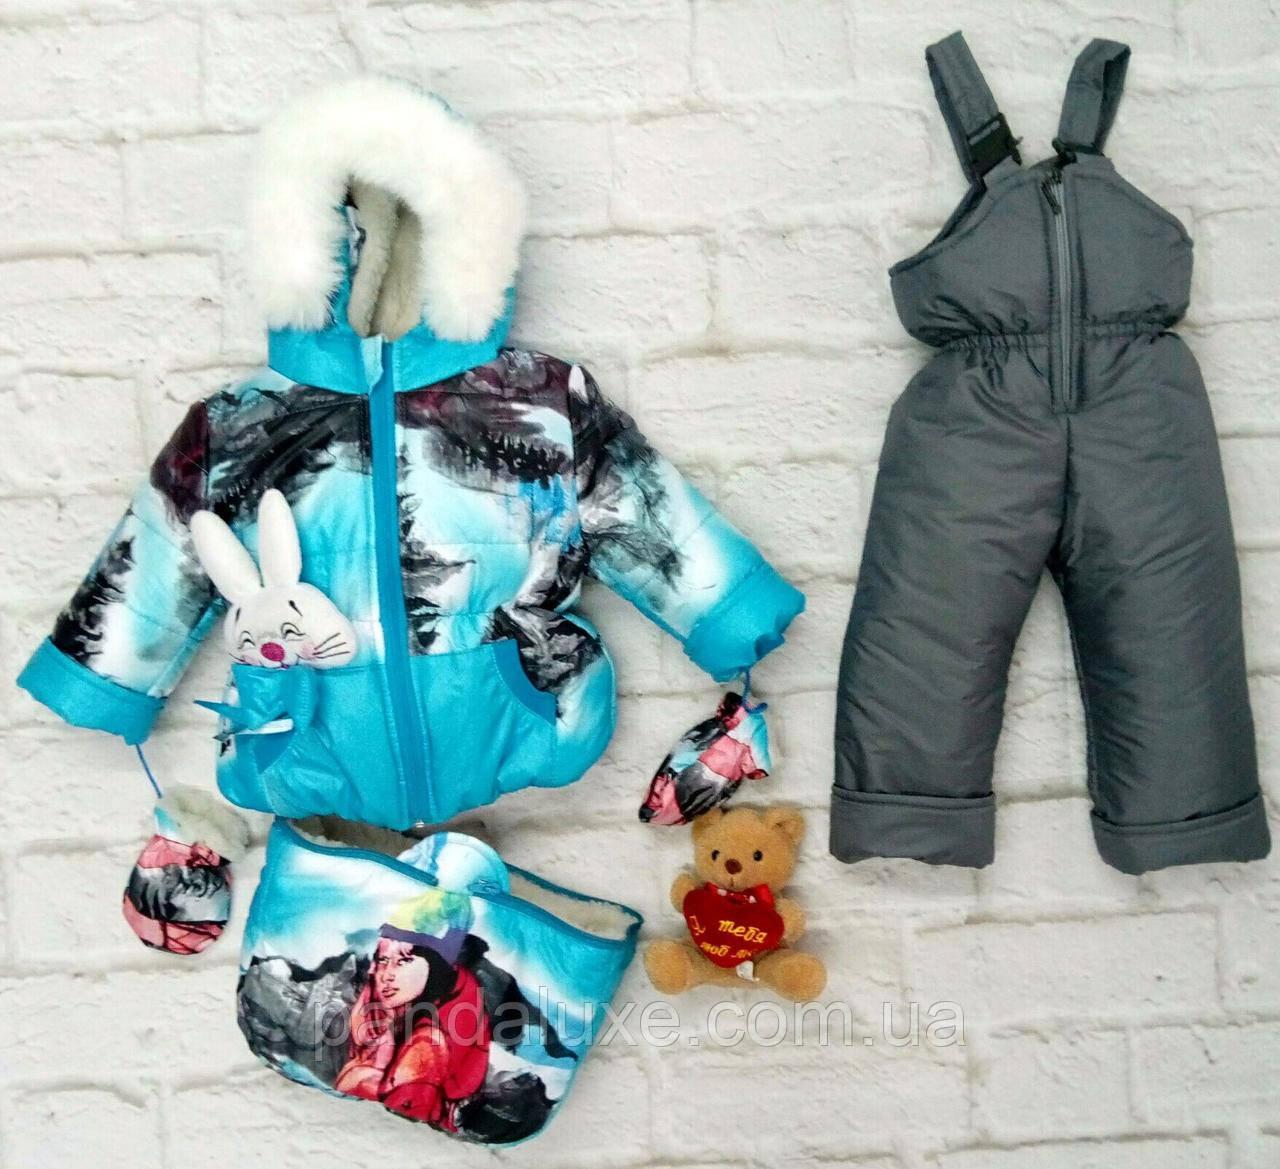 Детский зимний комплект тройка комбинезон для девочки до 2-х лет